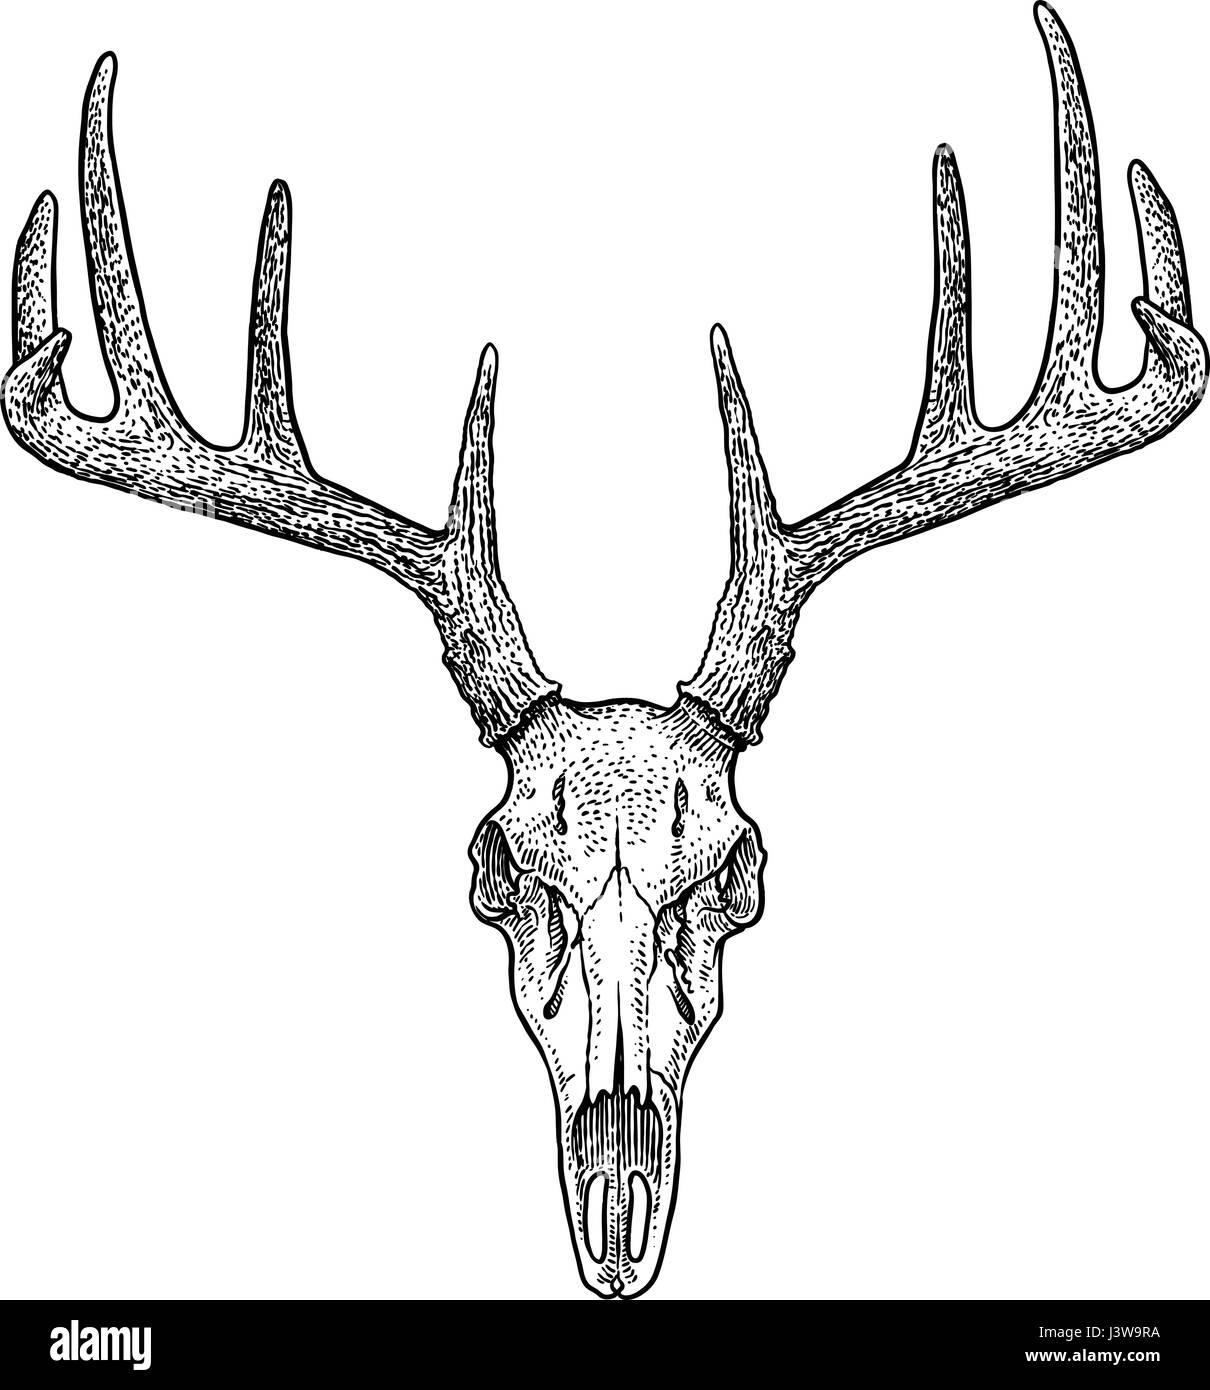 Deer skull illustration, drawing, engraving, ink, line art, vector - Stock Image